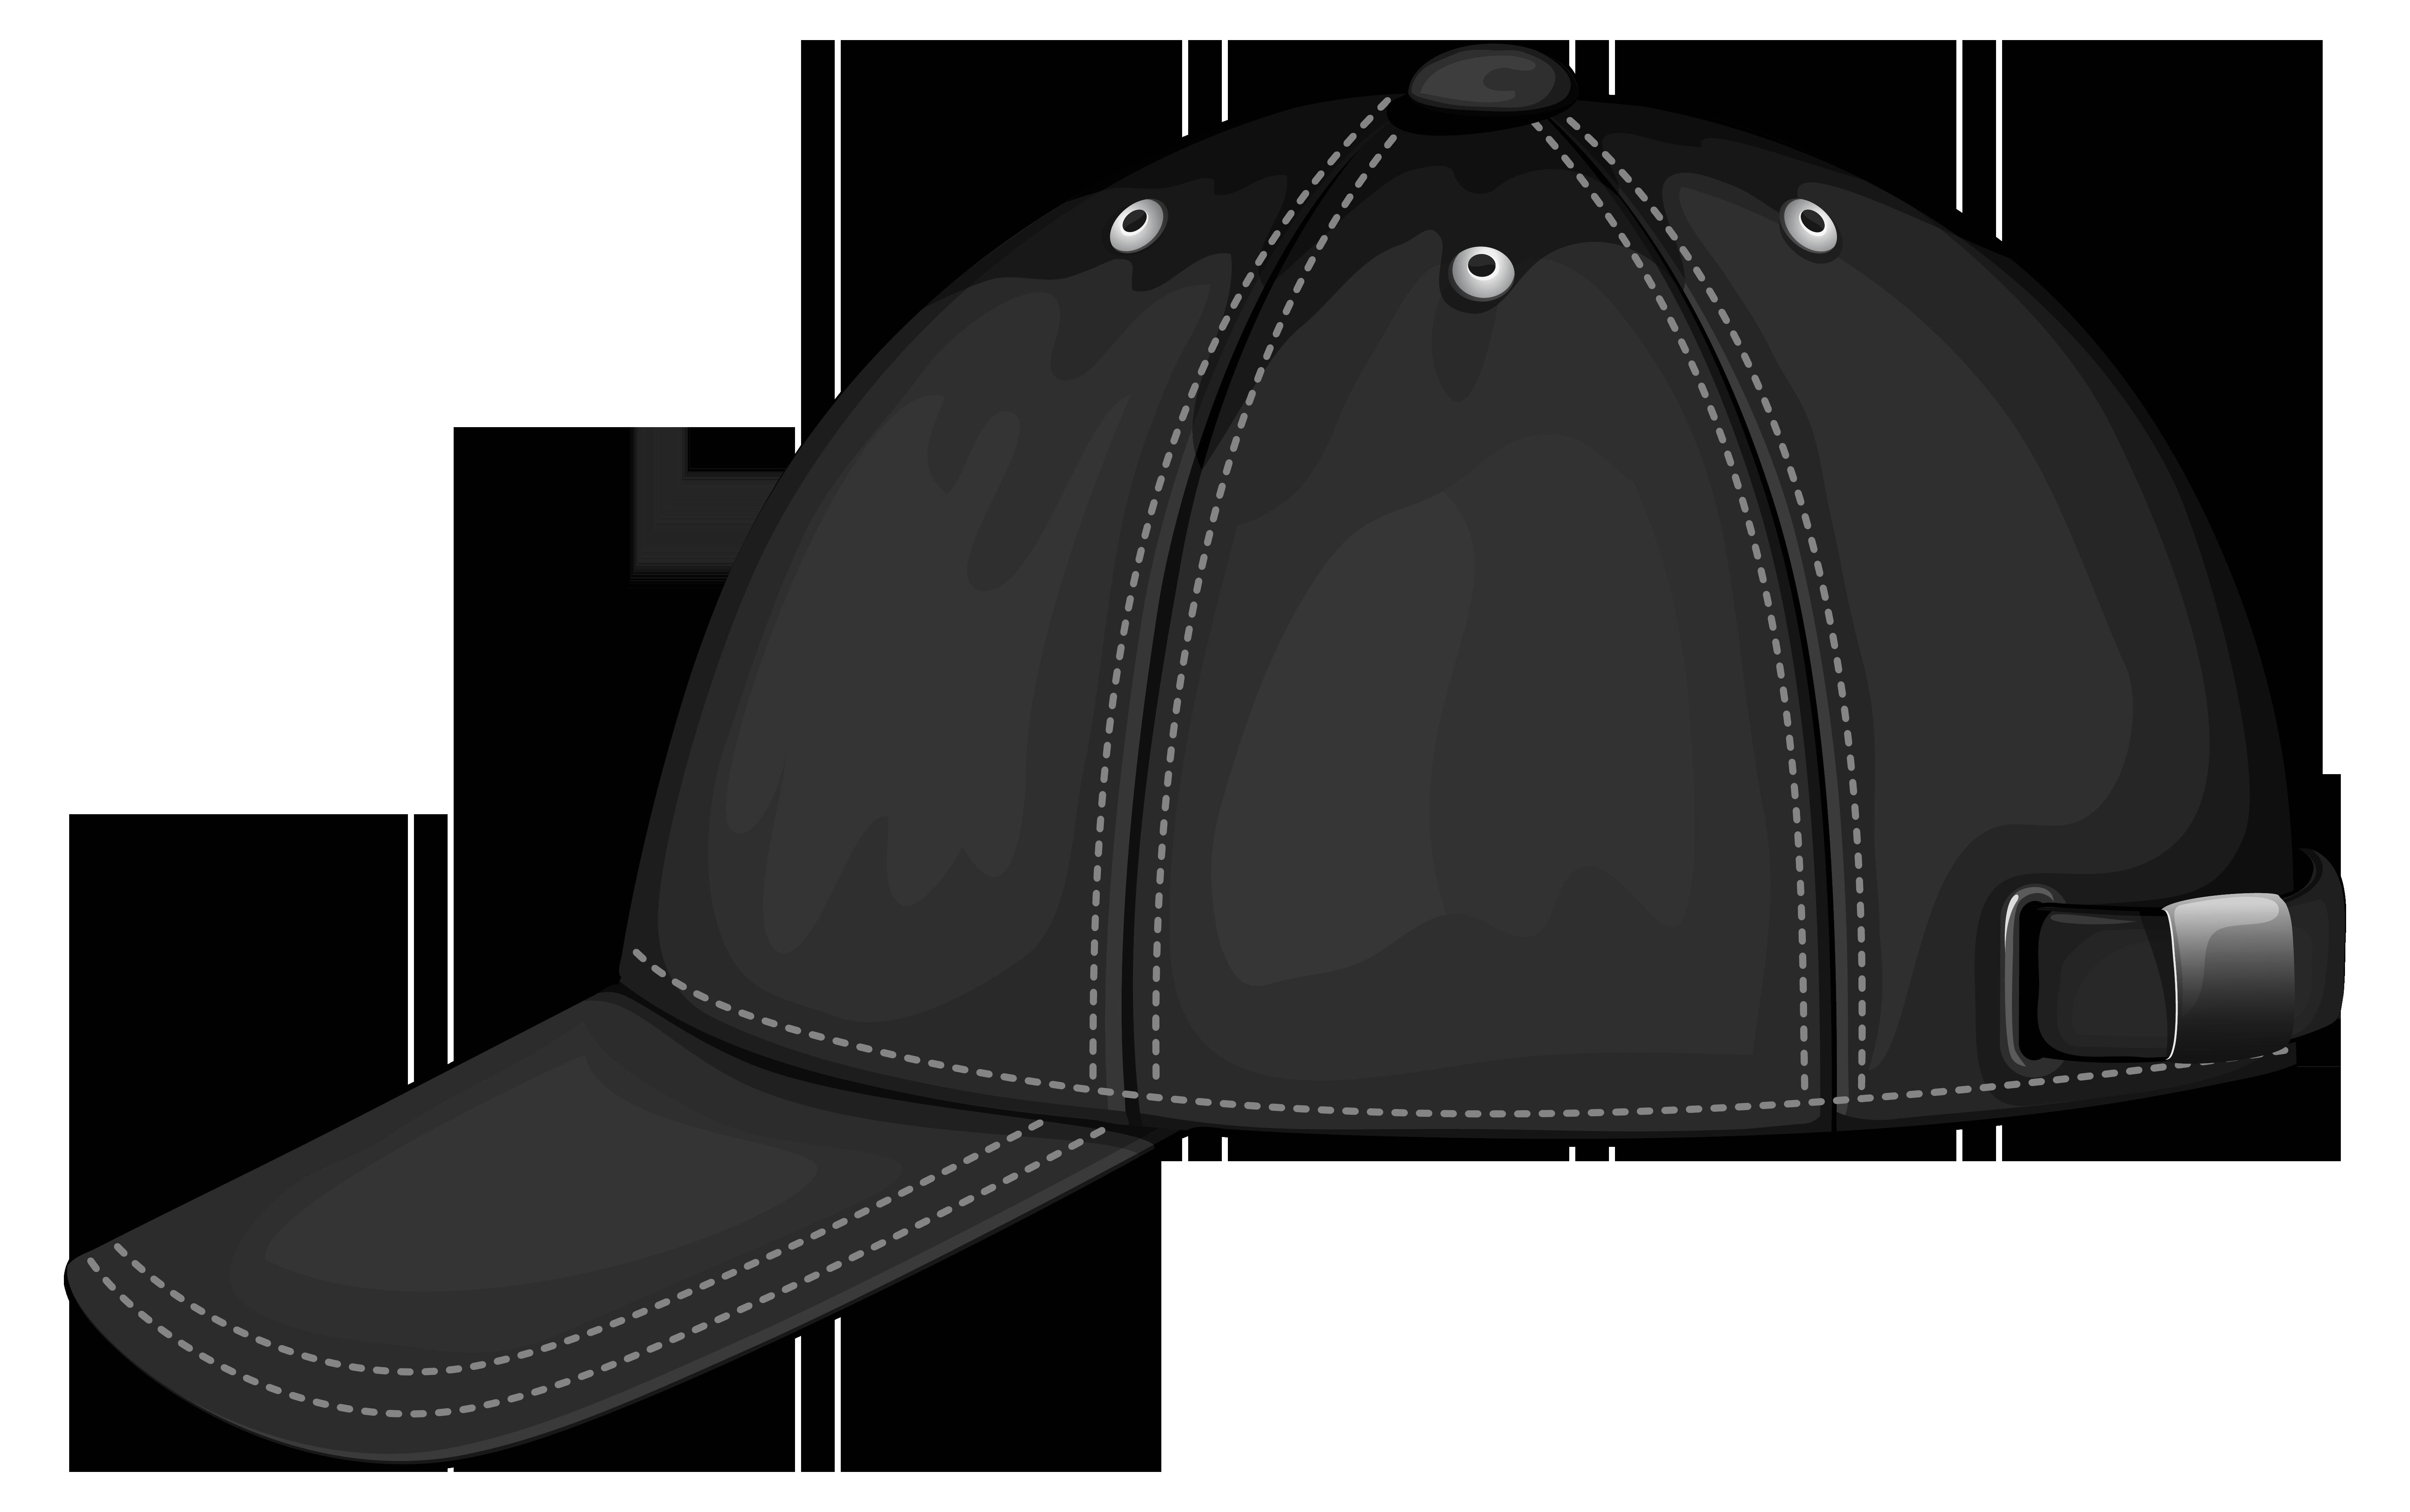 Black Baseball Cap PNG Image Clipart.